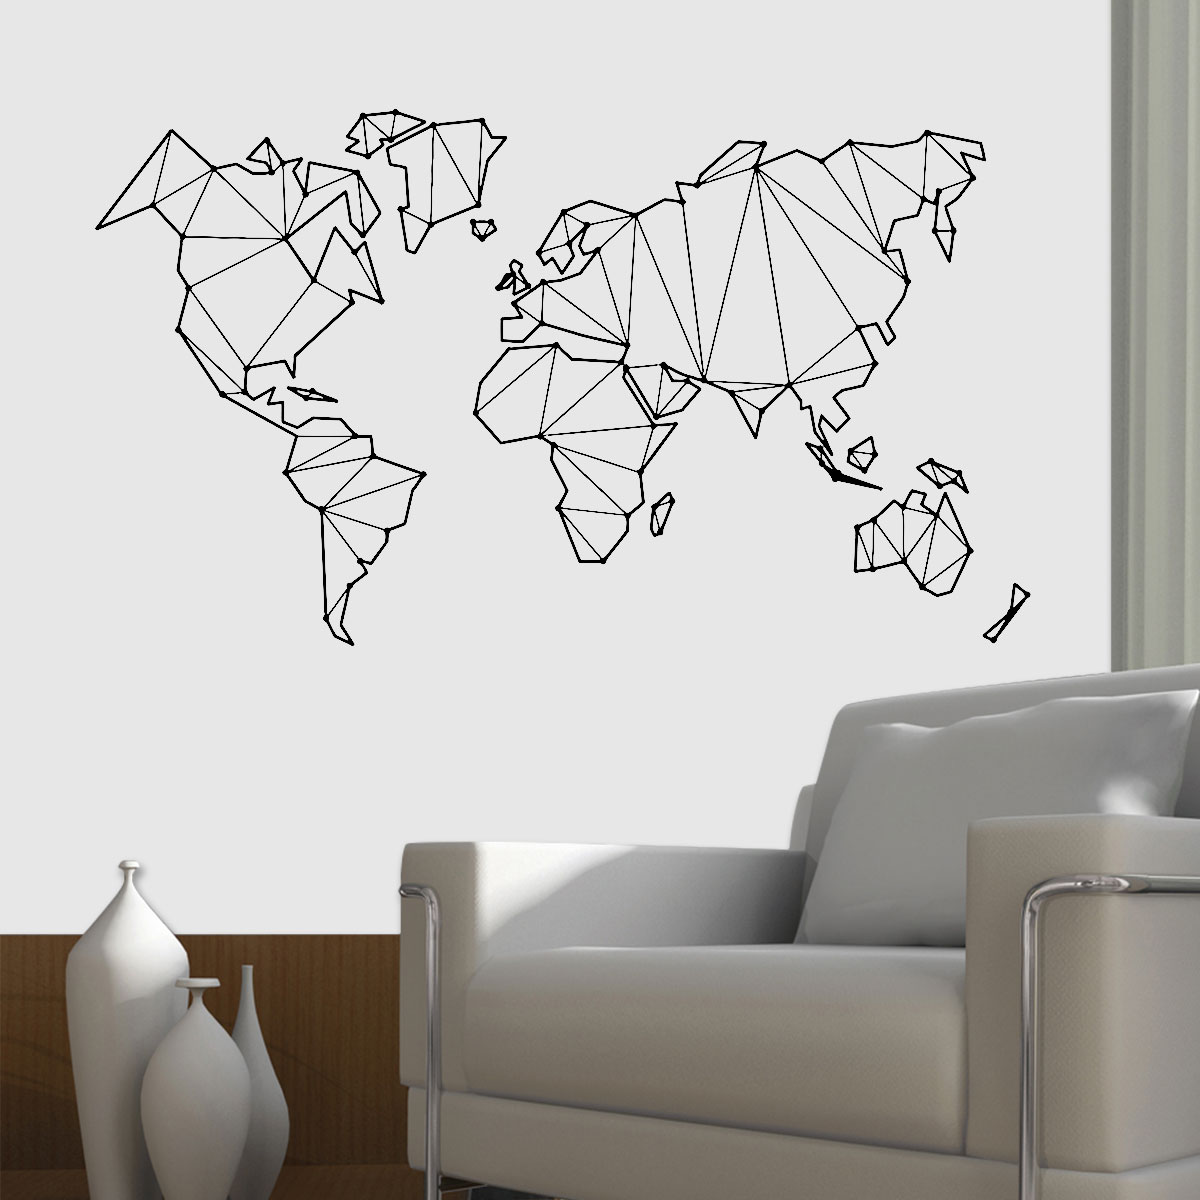 comprar mapa mundi para parede Adesivo De Parede Mapa Mundi Em Low Poly comprar mapa mundi para parede